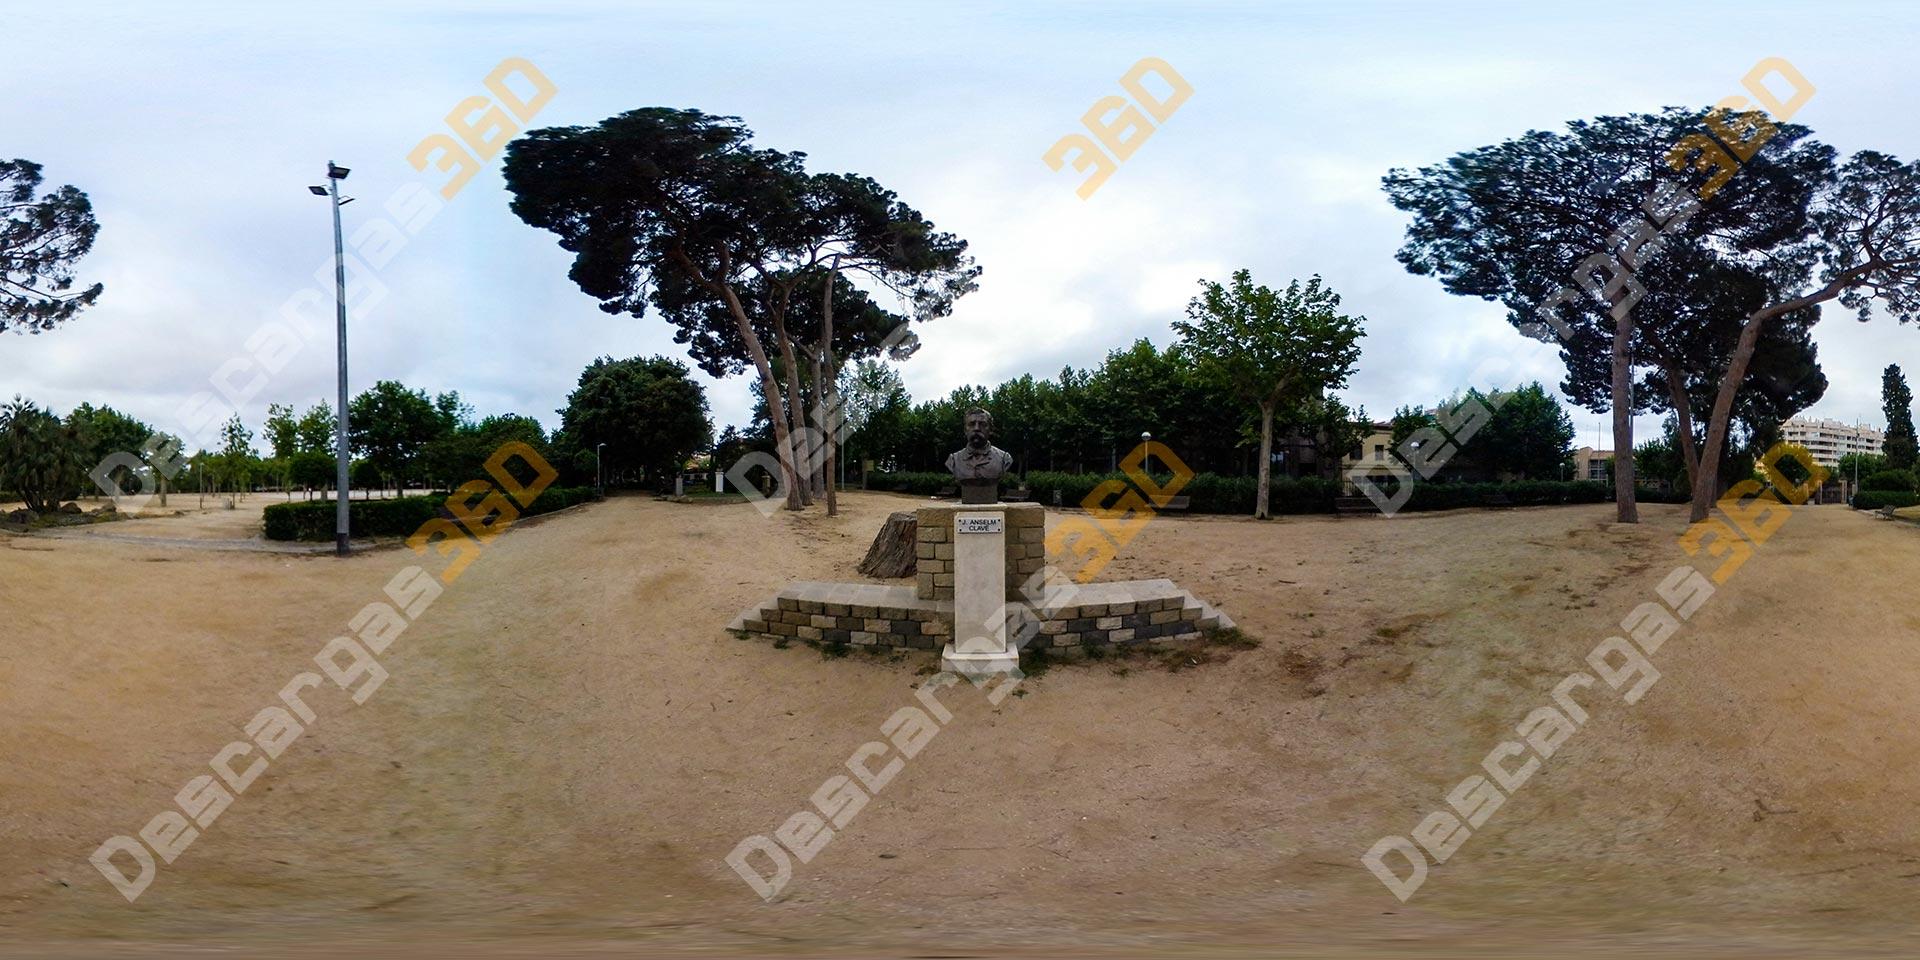 Busto en parque - FOTO 360 Naturaleza - Descargas 360 grados